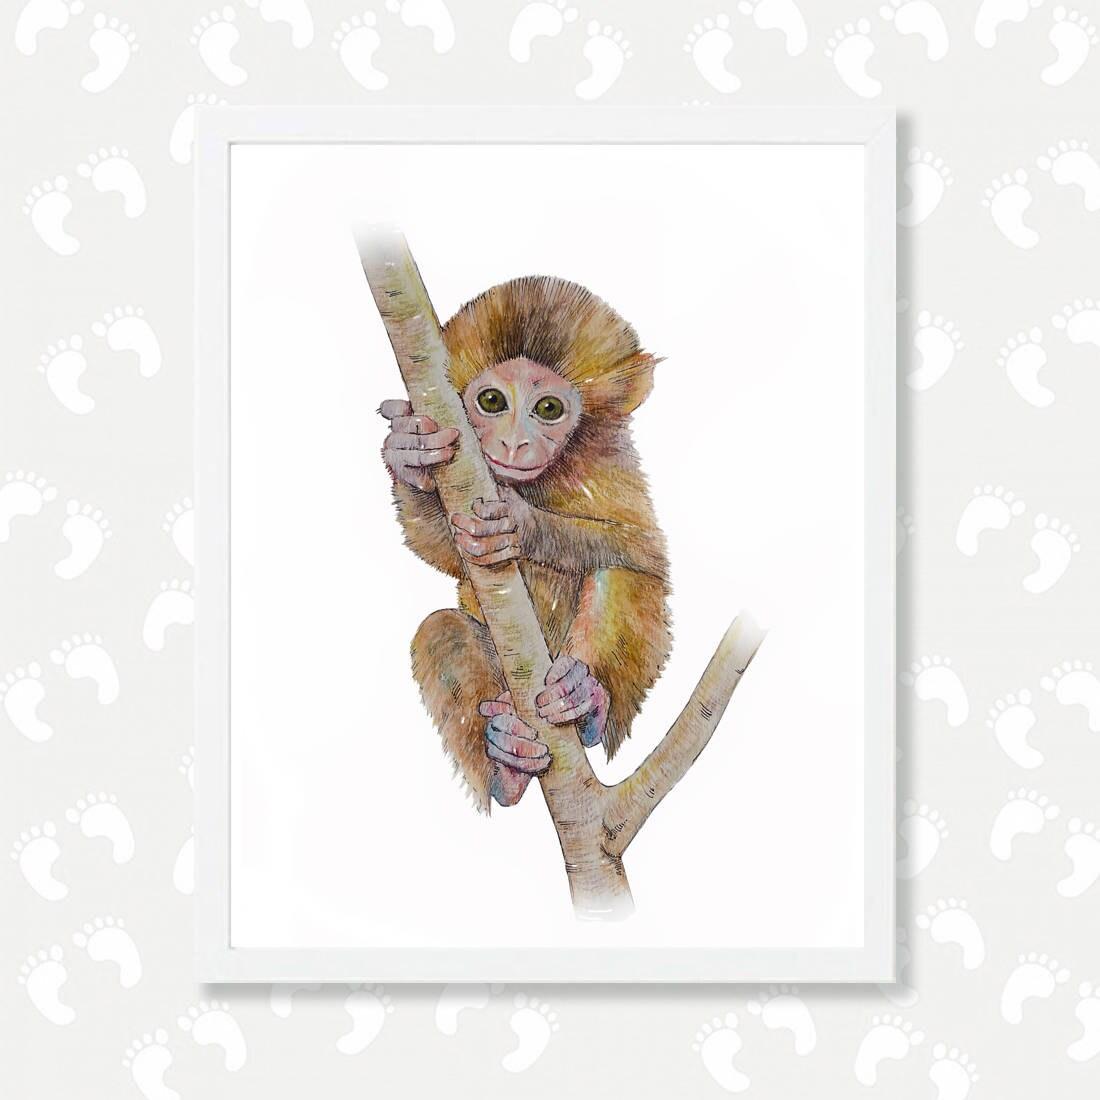 Berühmt Druckbare Affen Vorlage Galerie - Entry Level Resume ...